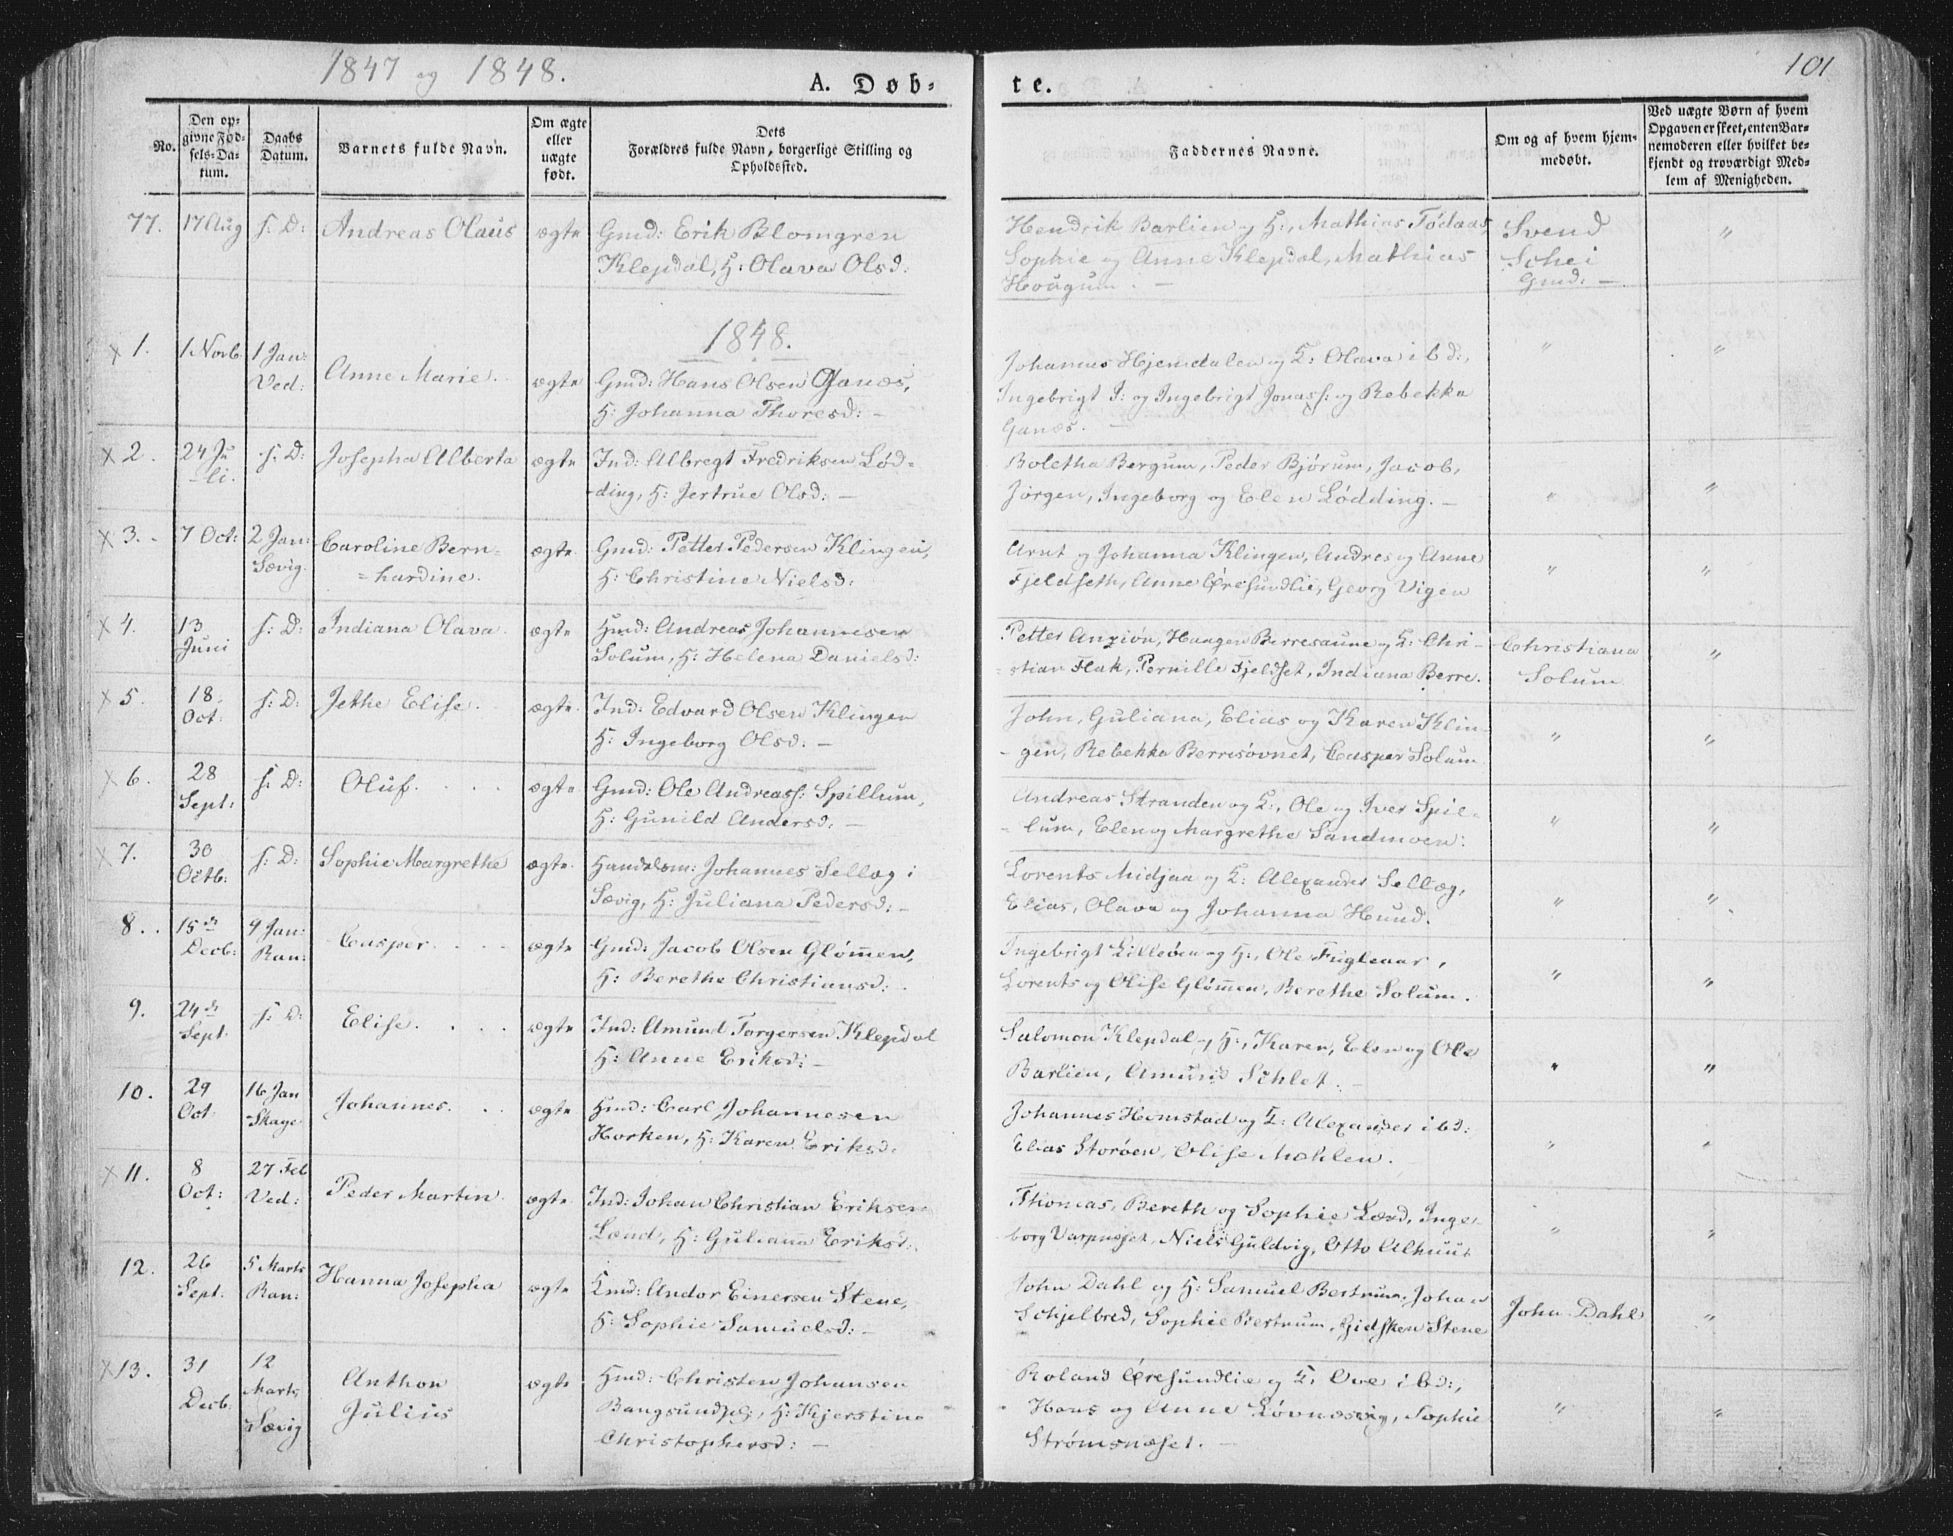 SAT, Ministerialprotokoller, klokkerbøker og fødselsregistre - Nord-Trøndelag, 764/L0551: Ministerialbok nr. 764A07a, 1824-1864, s. 101